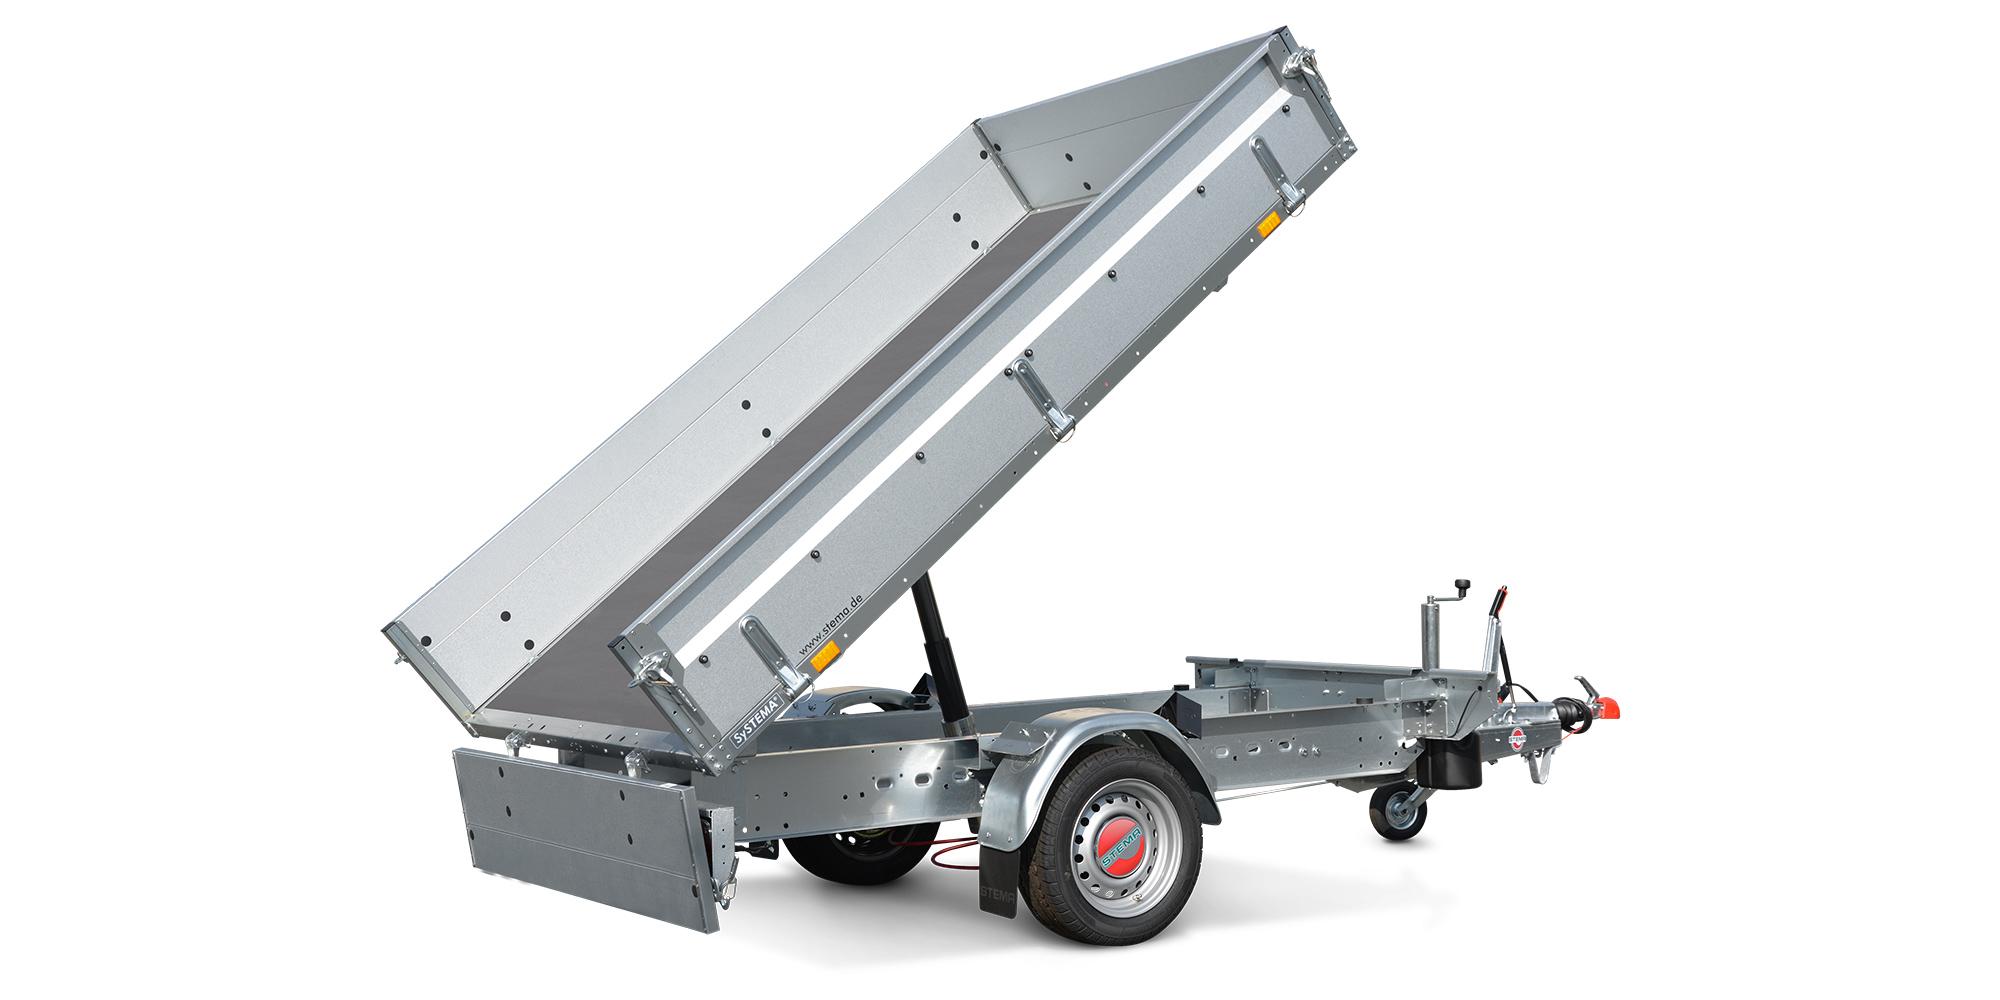 Trailer Direct - STEMA Anhänger Sortiment kaufen - SHRK O2 15-25-15.1